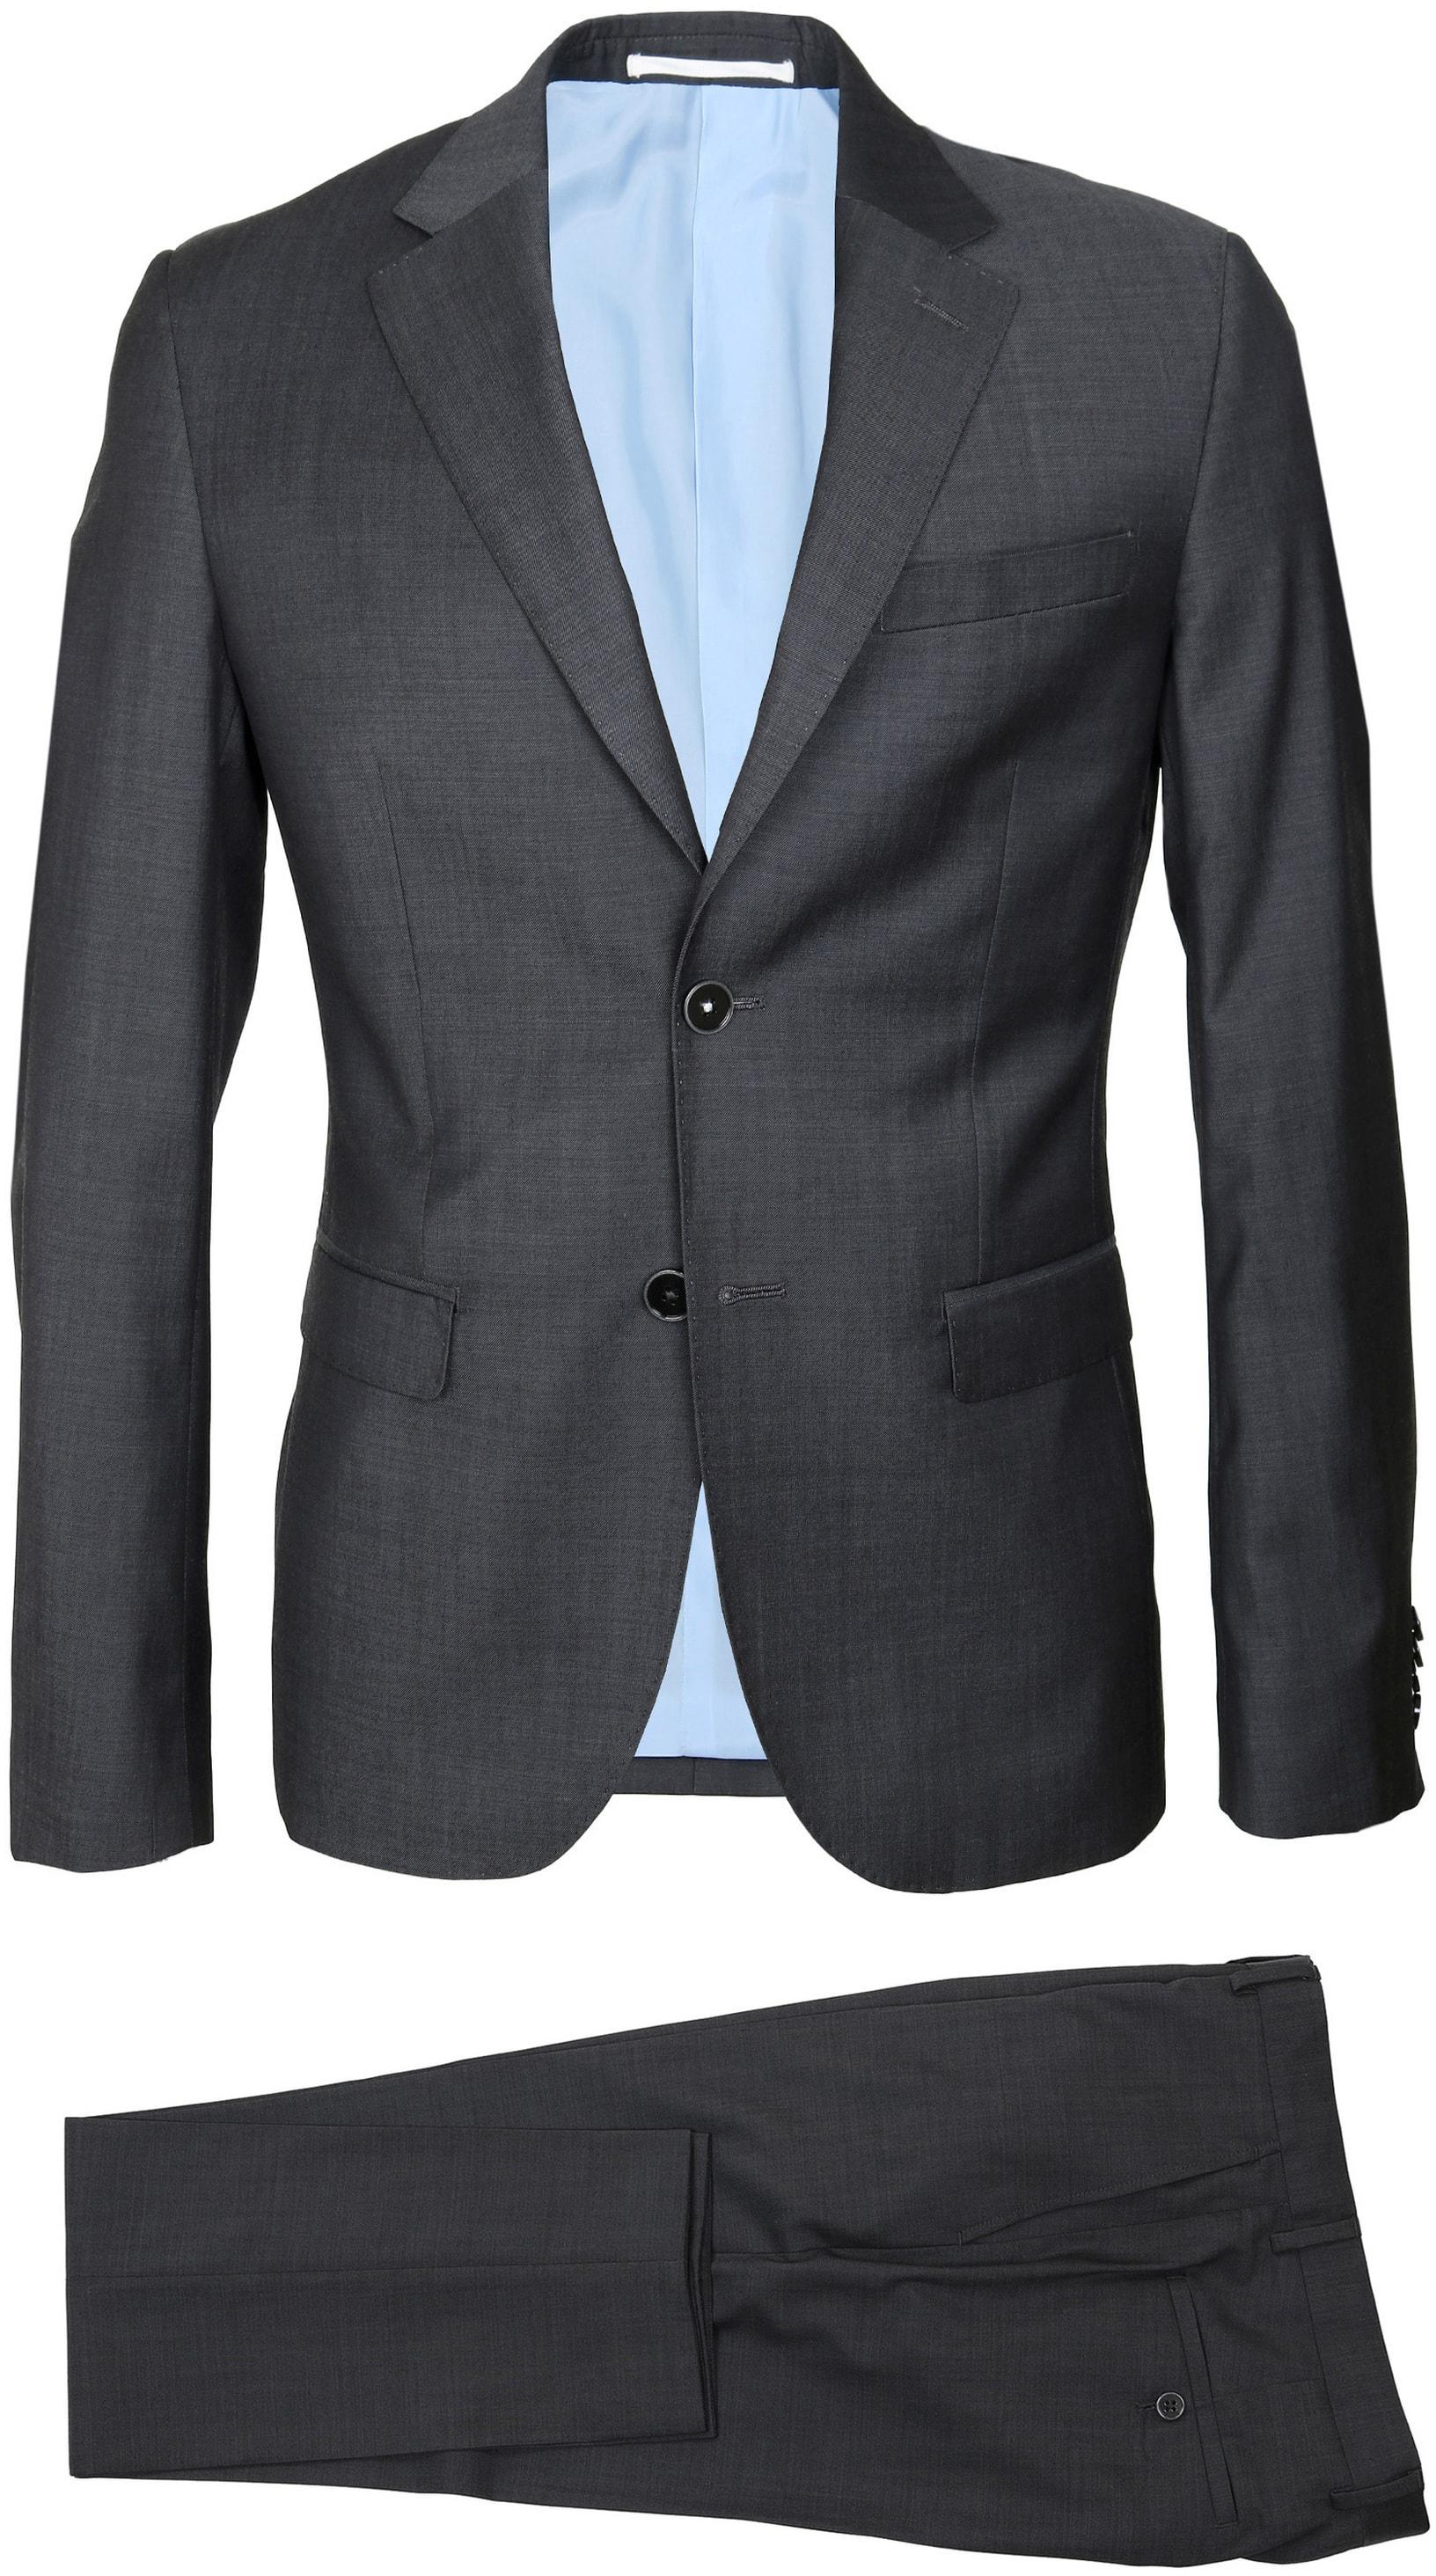 Suitable Anzug Strato Dunkelgrau foto 2